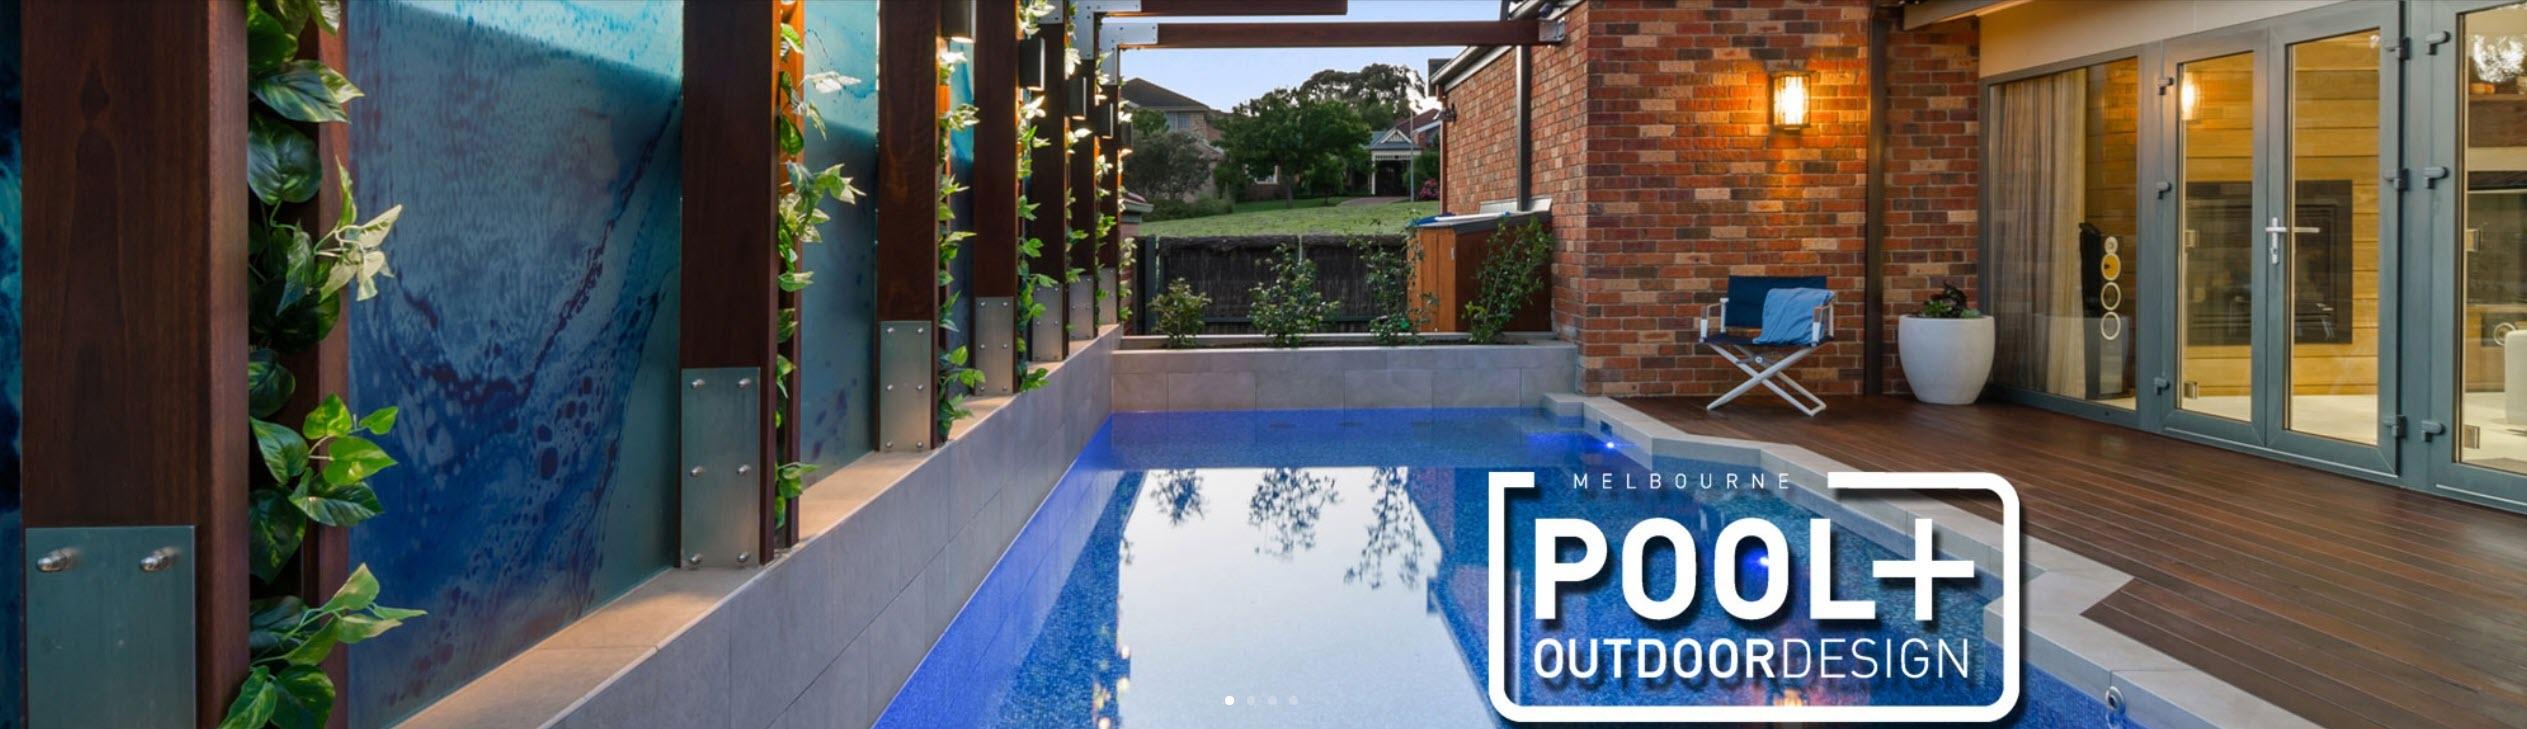 Melbourne Pool + Outdoor Design